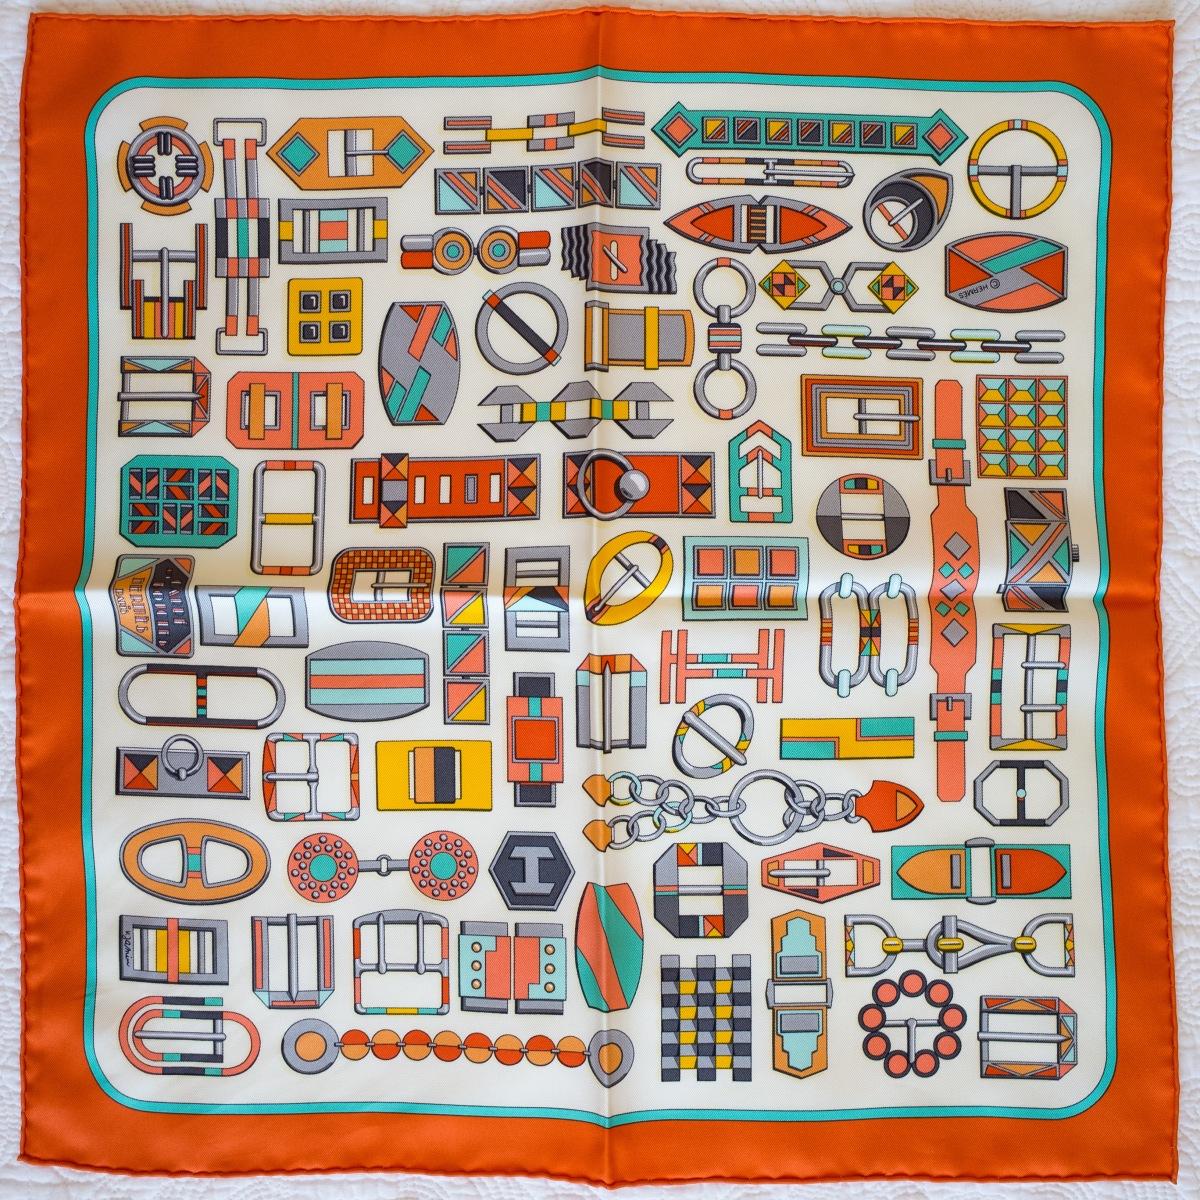 Carre en Boucles, Virginie Jamin, carre, knot, knotting, tutorial, hermes pocket square, hermes gavroche, hermes carre, Hermes Schal, эрмес, платок, карре, как красиво завязать платок, how to wear a scarf